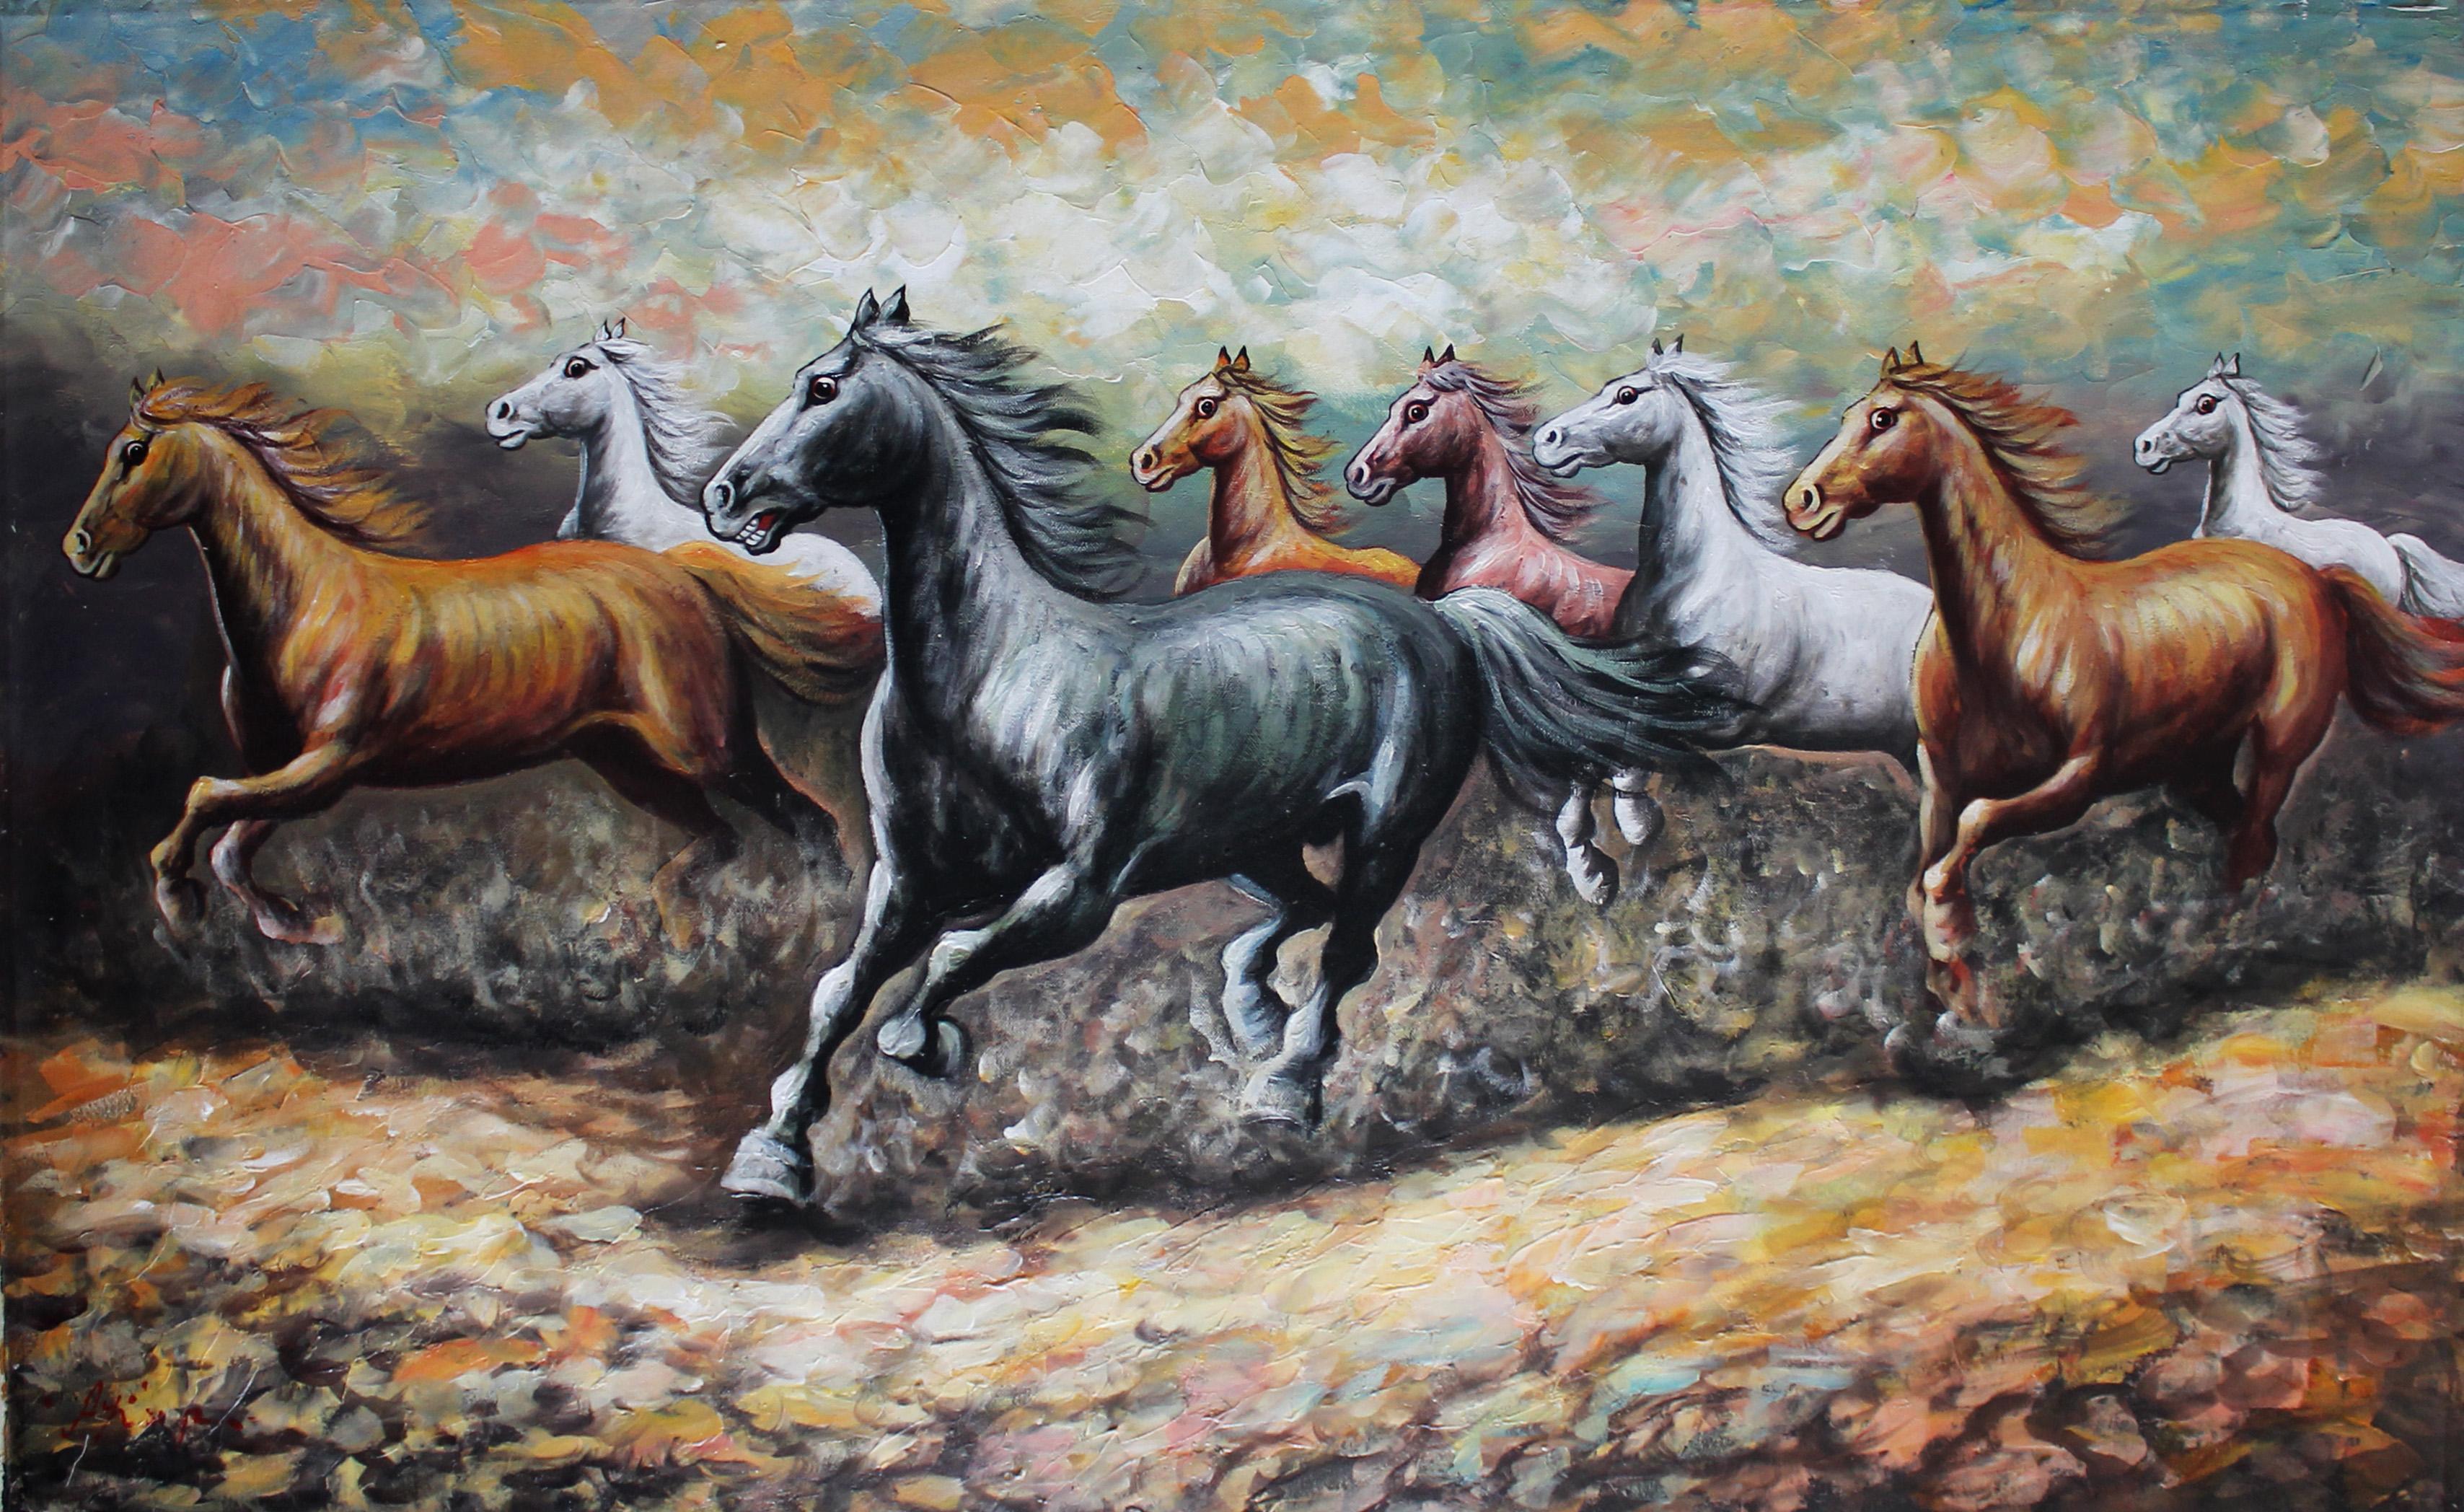 7 Horses Wallpaper Download Hd Wallpaper For Desktop Background